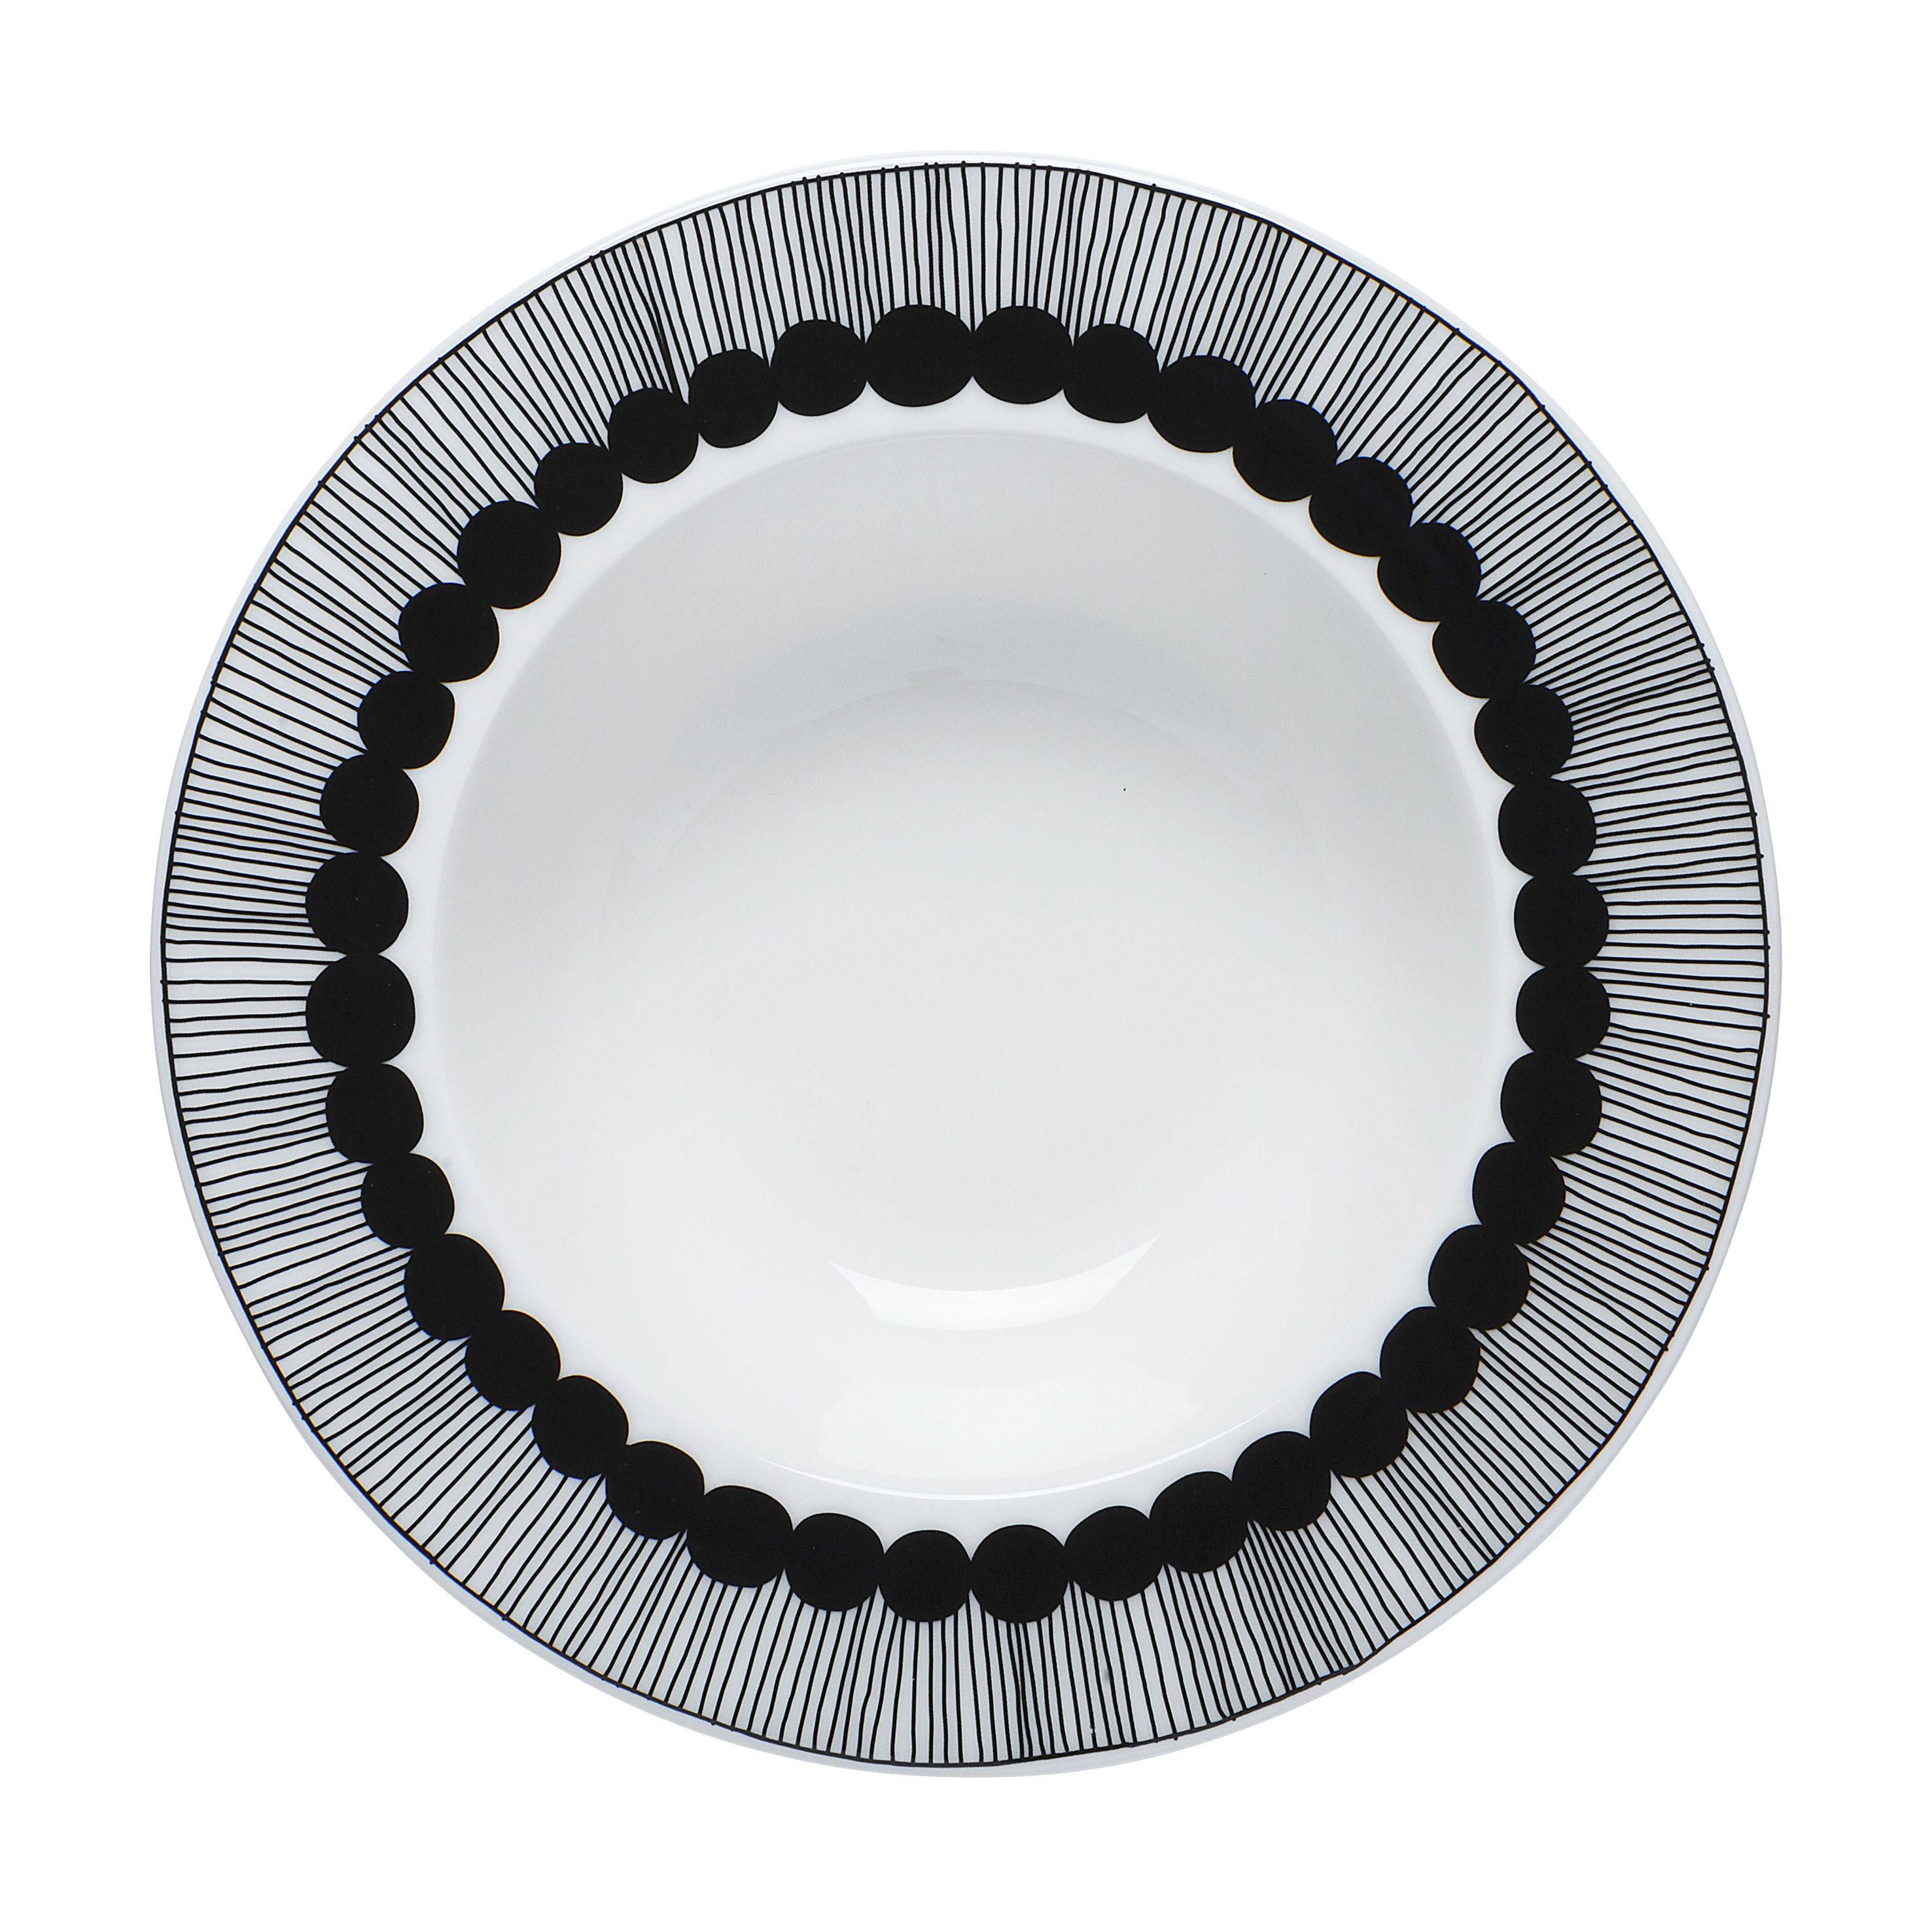 Tavola - Piatti  - Piatto fondo Siirtolapuutarha - /Ø 20 cm di Marimekko - Bianco-nero - Porcellana smaltata